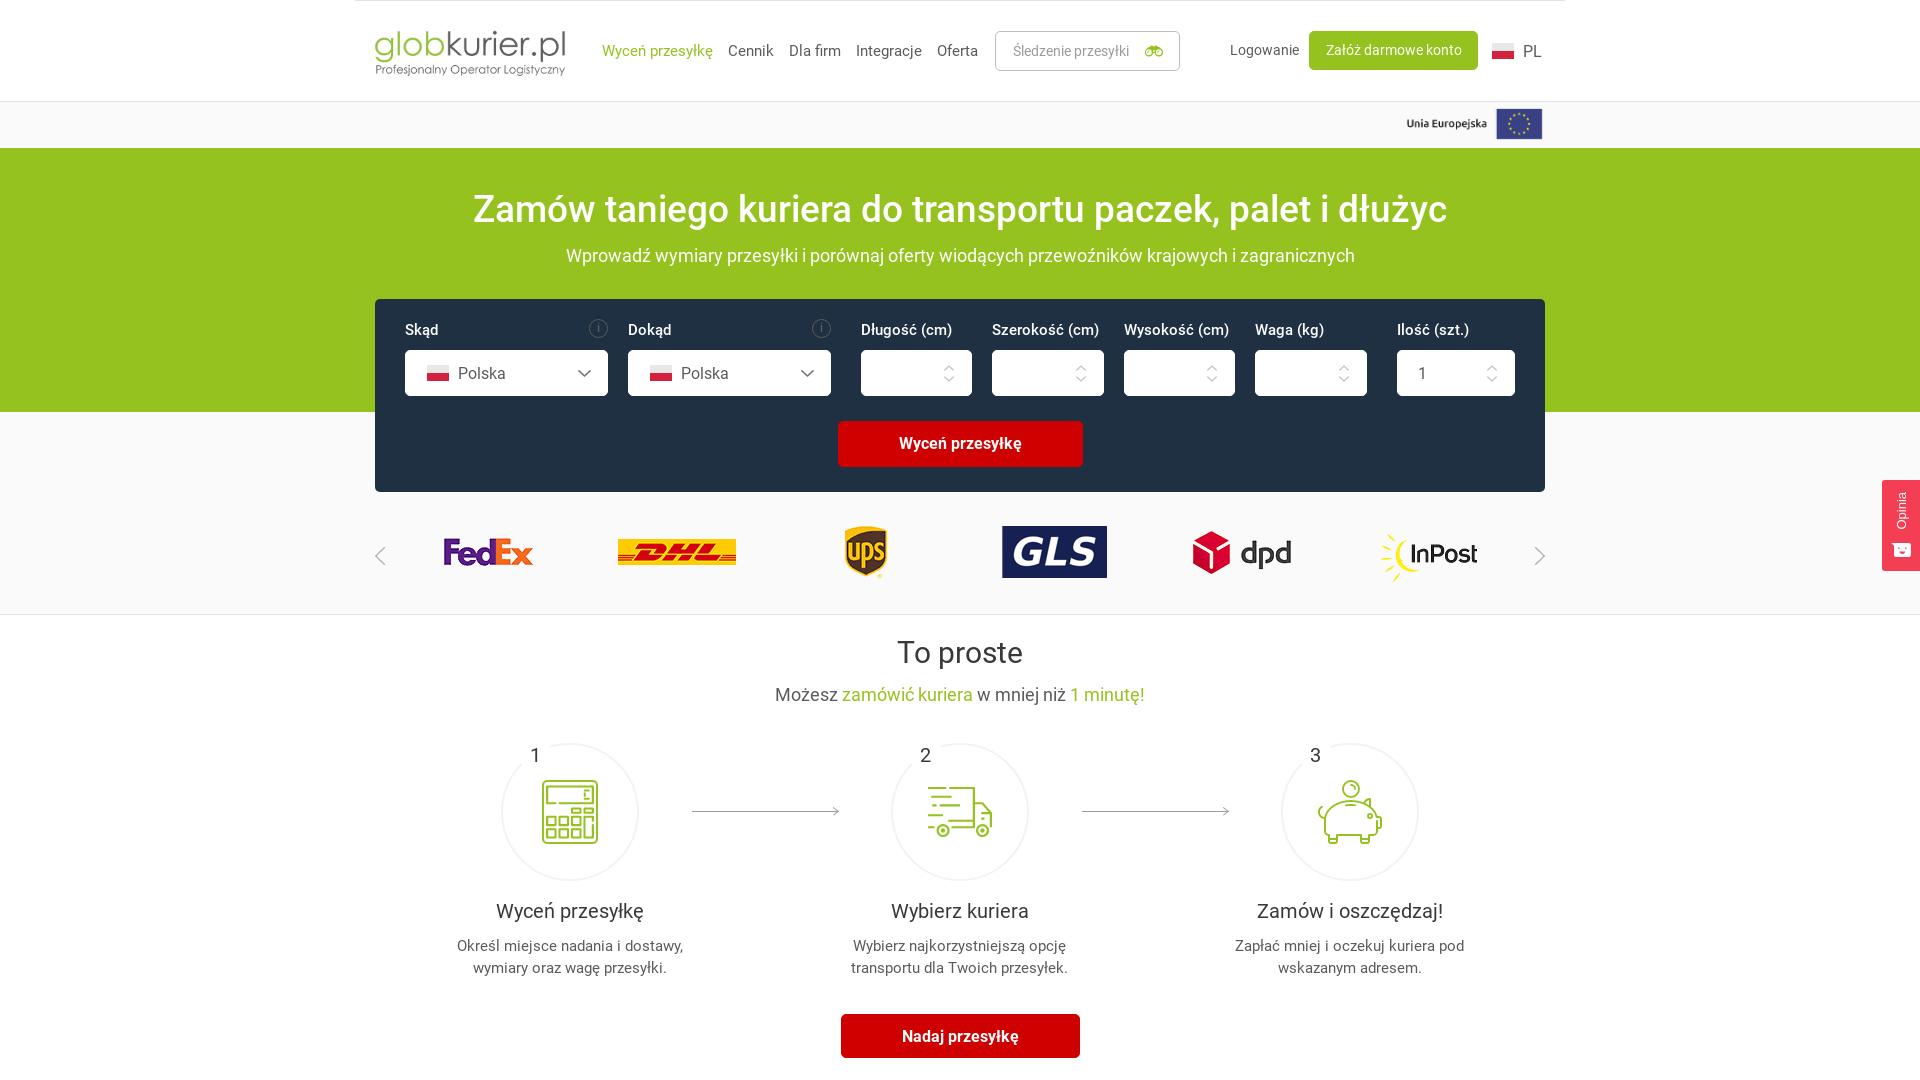 Globkurier [CPS] PL website